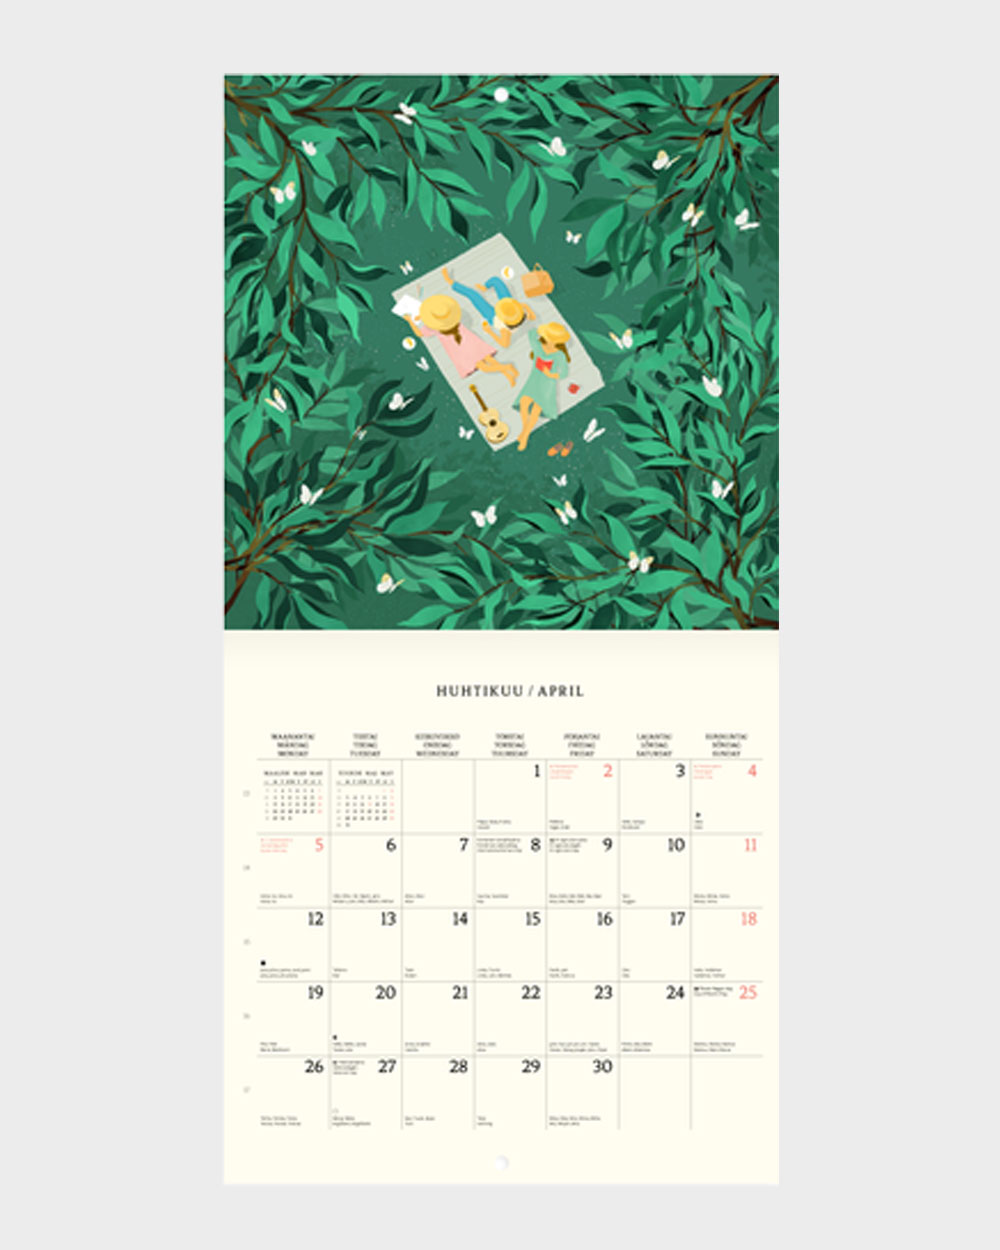 Polka Paper seinäkalenteri 2022 huhtikuu